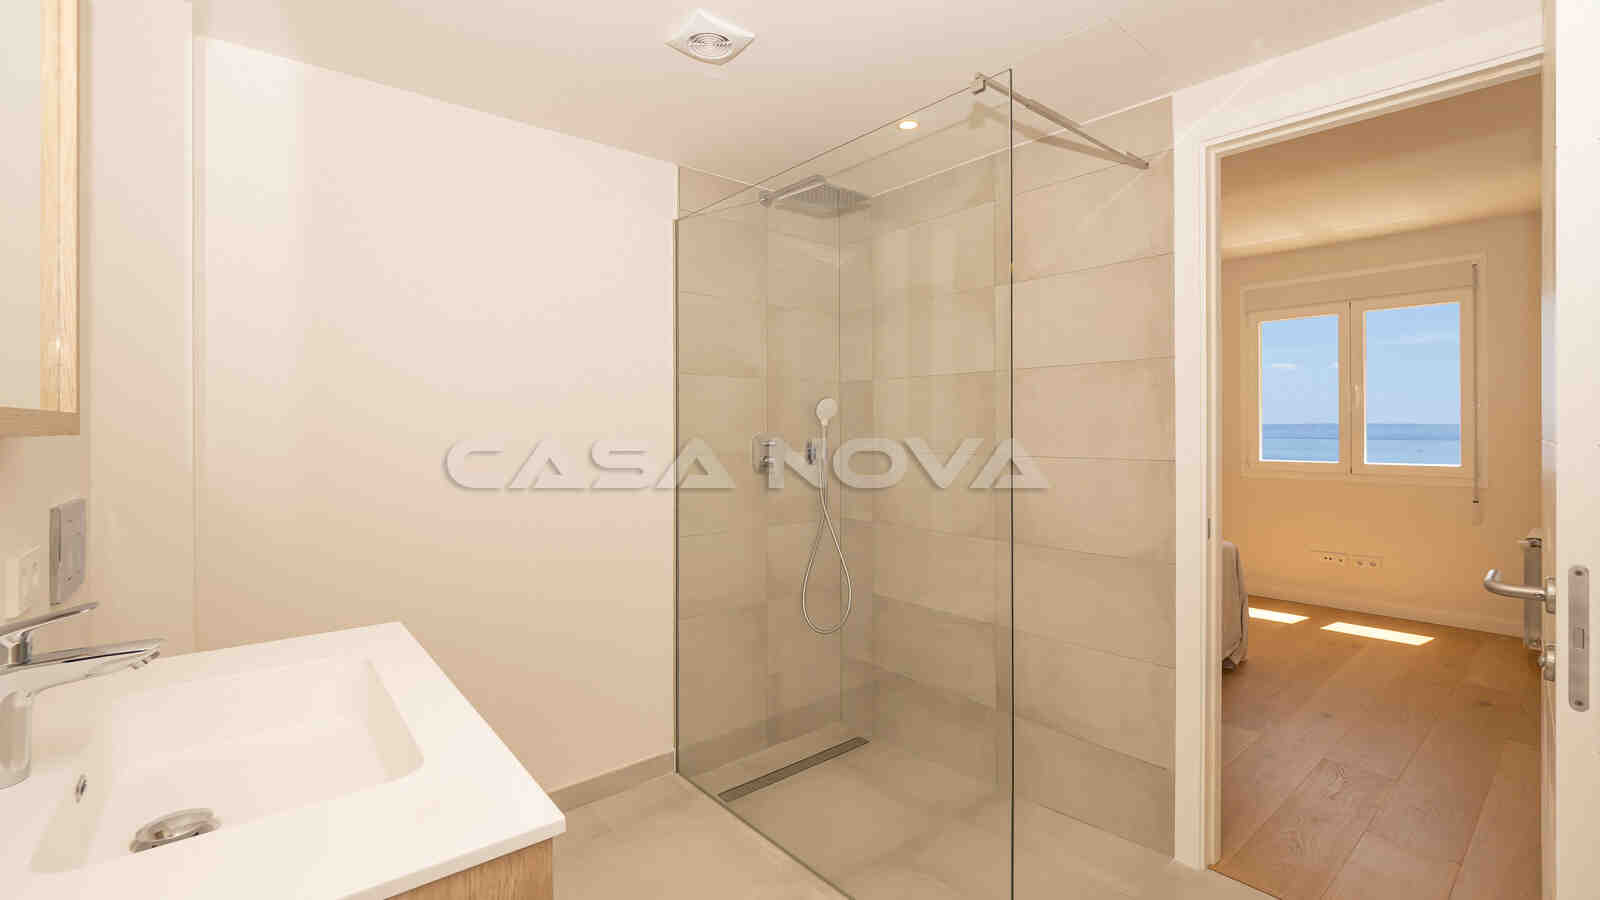 Ref. 1303017 - Modernes Badezimmer en Suite